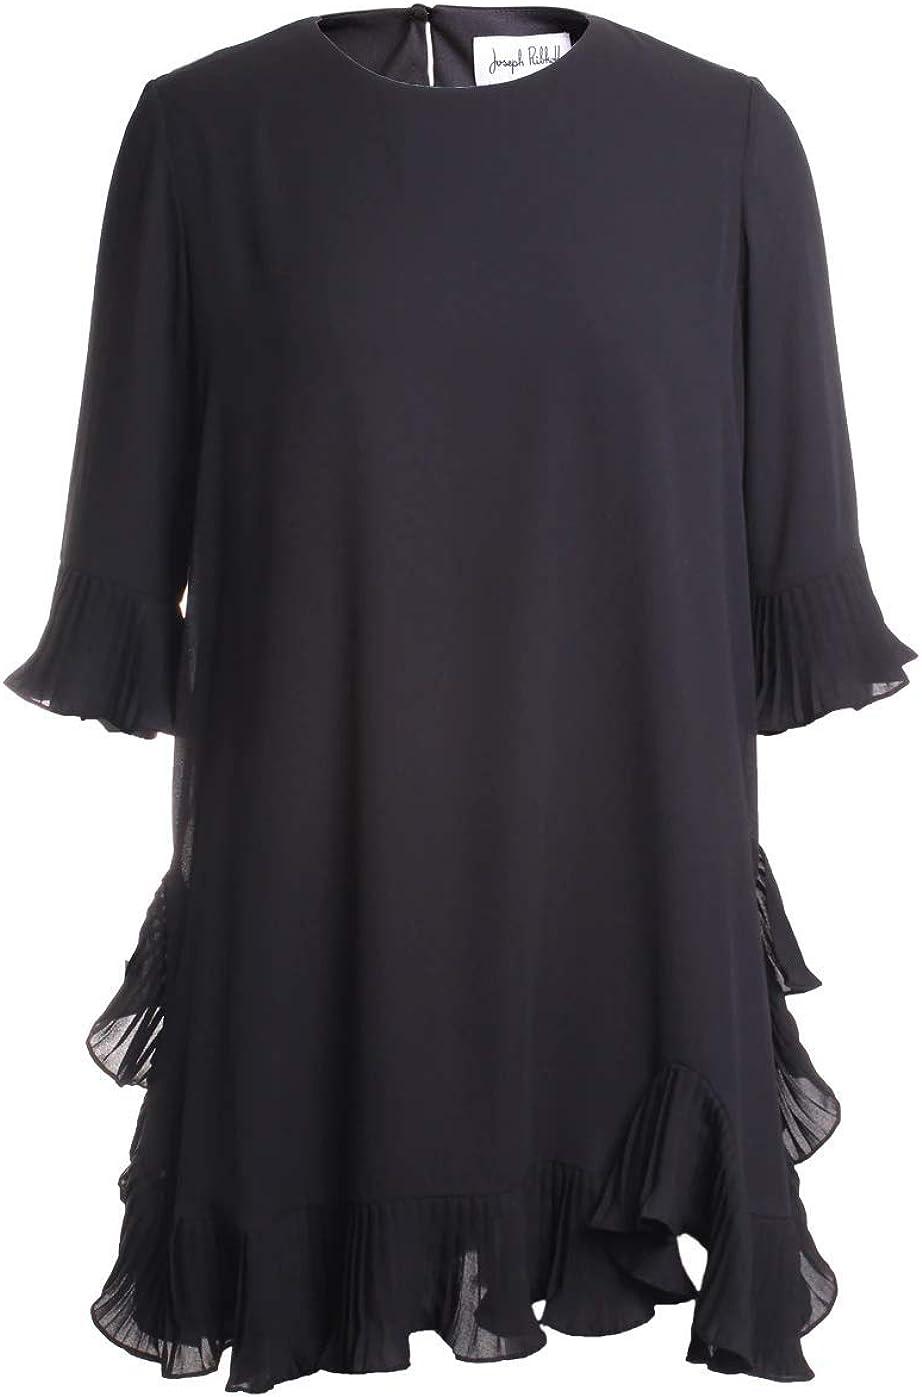 Joseph Ribkoff Women's Tunic/Dress Style 191239 Black